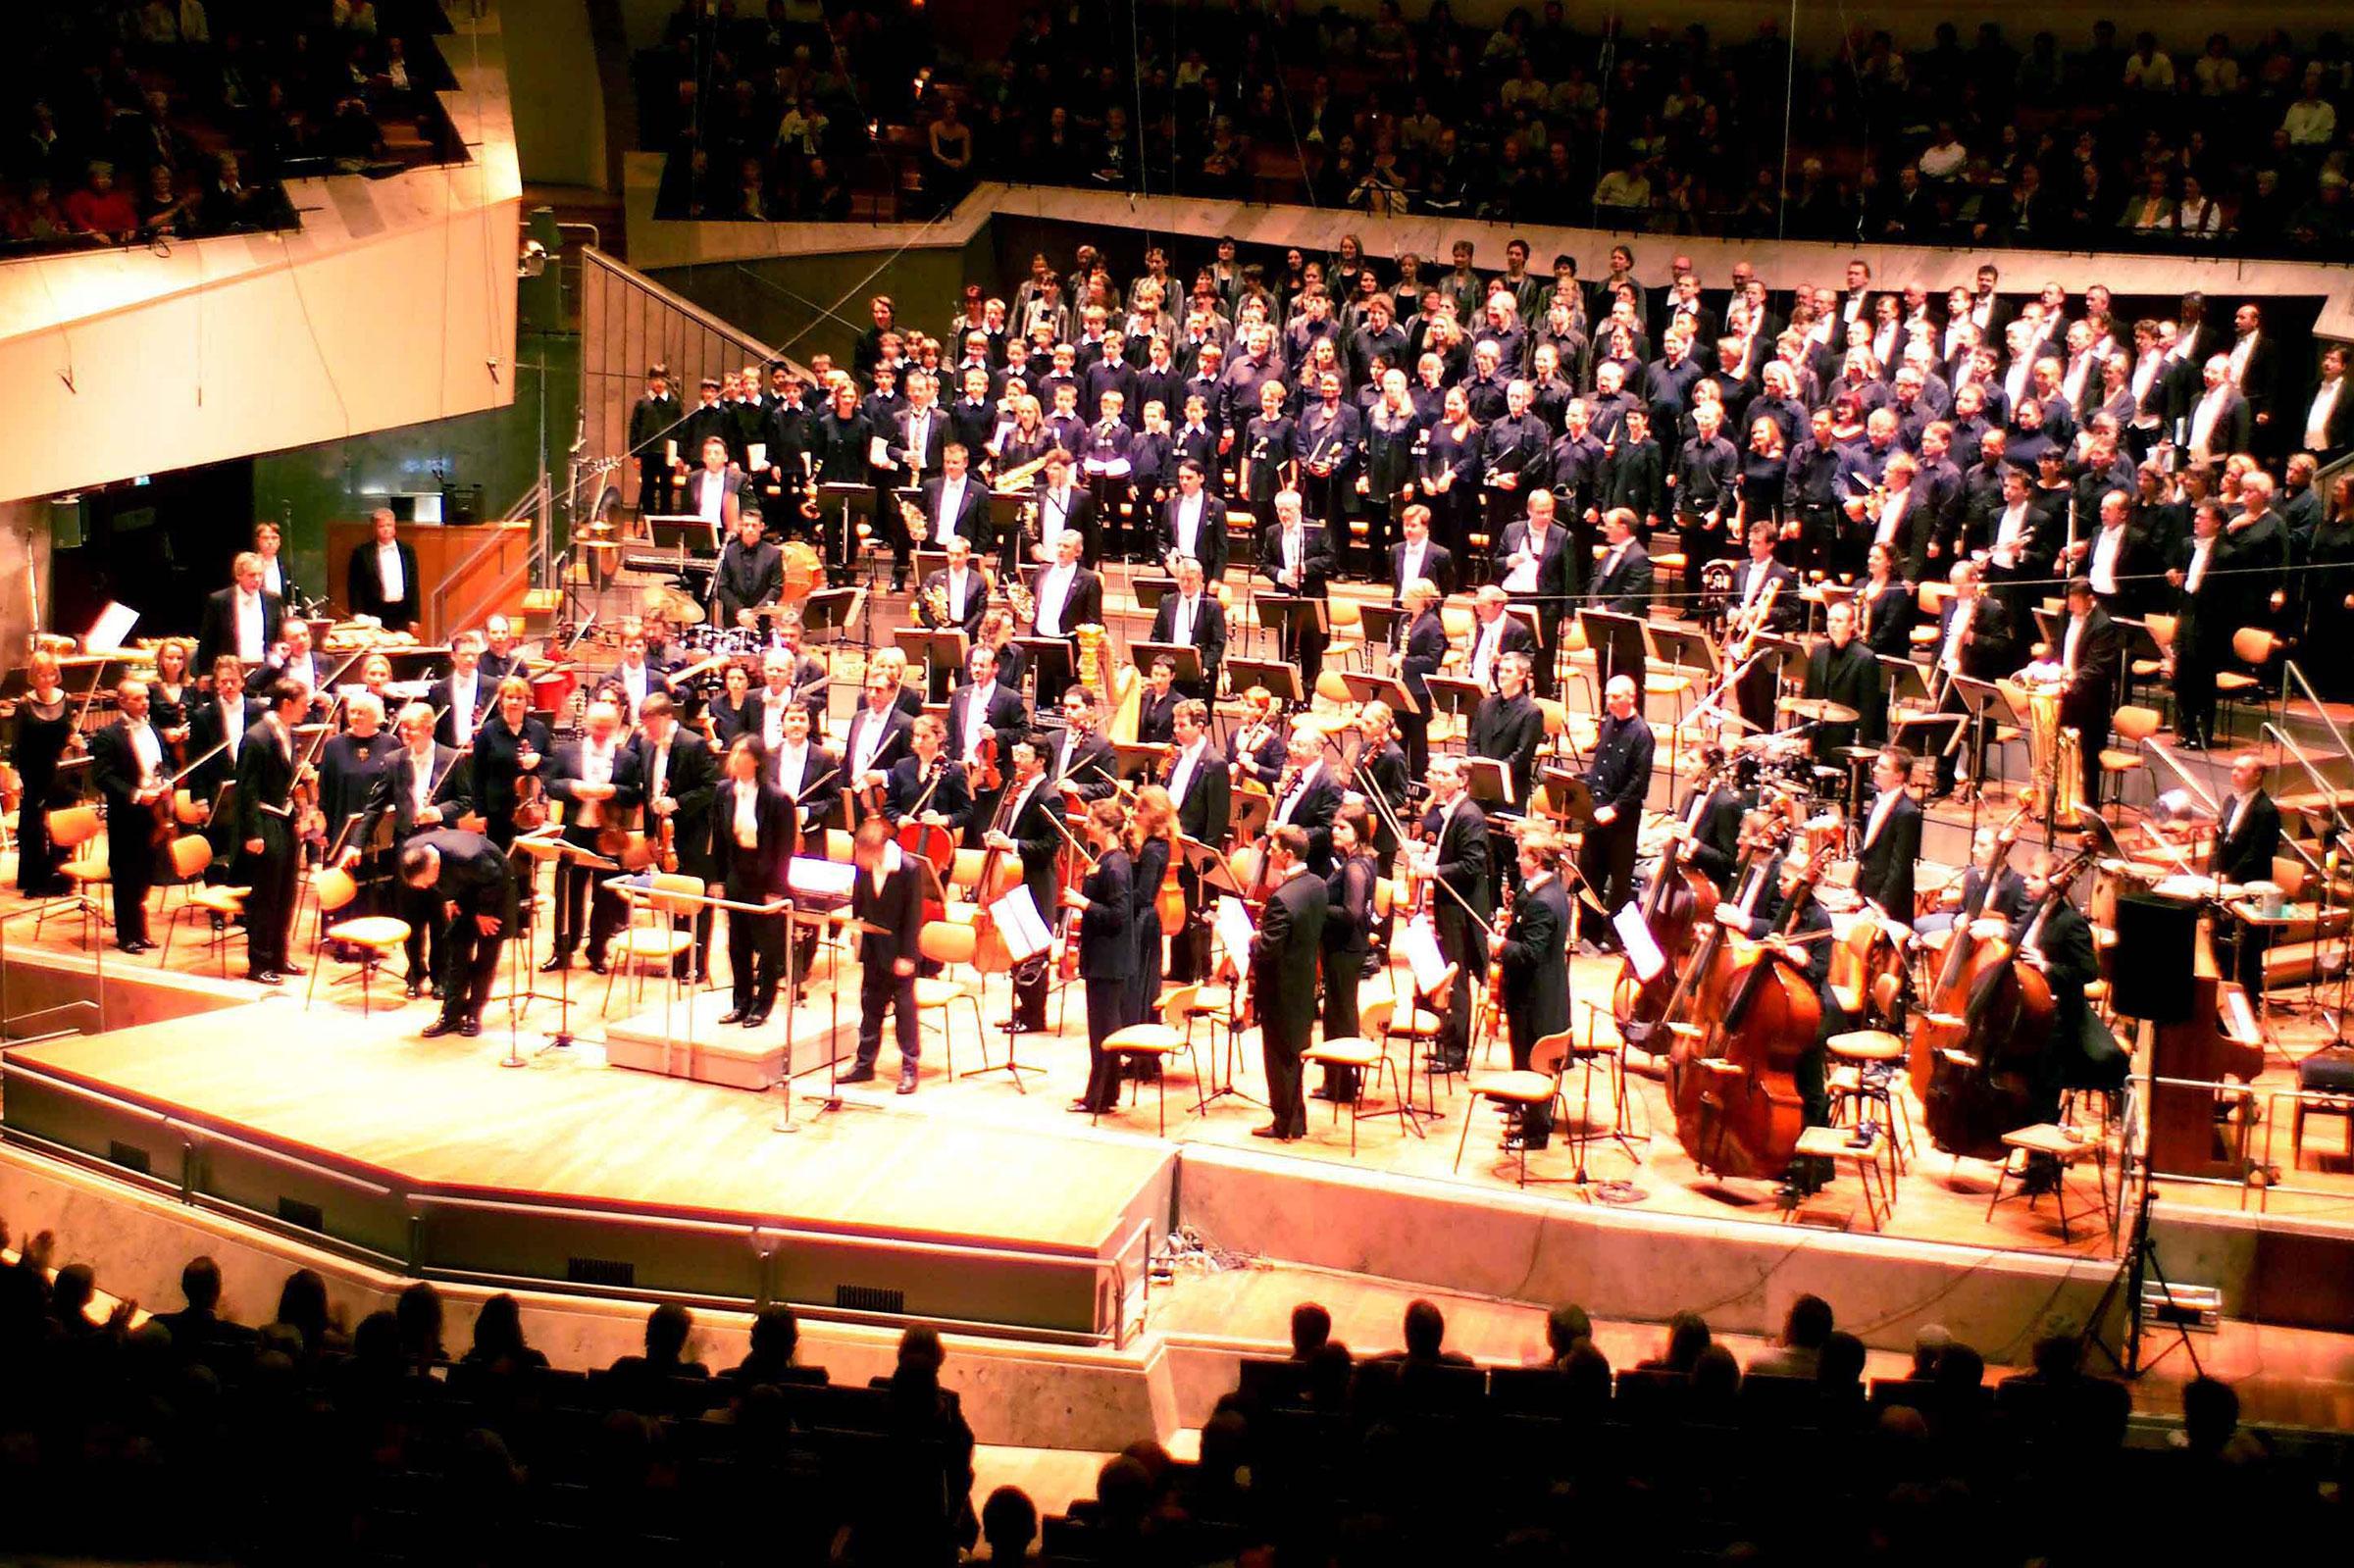 Performing Bernstein's Mass with Kent Nagano, Berlin (November 2003)